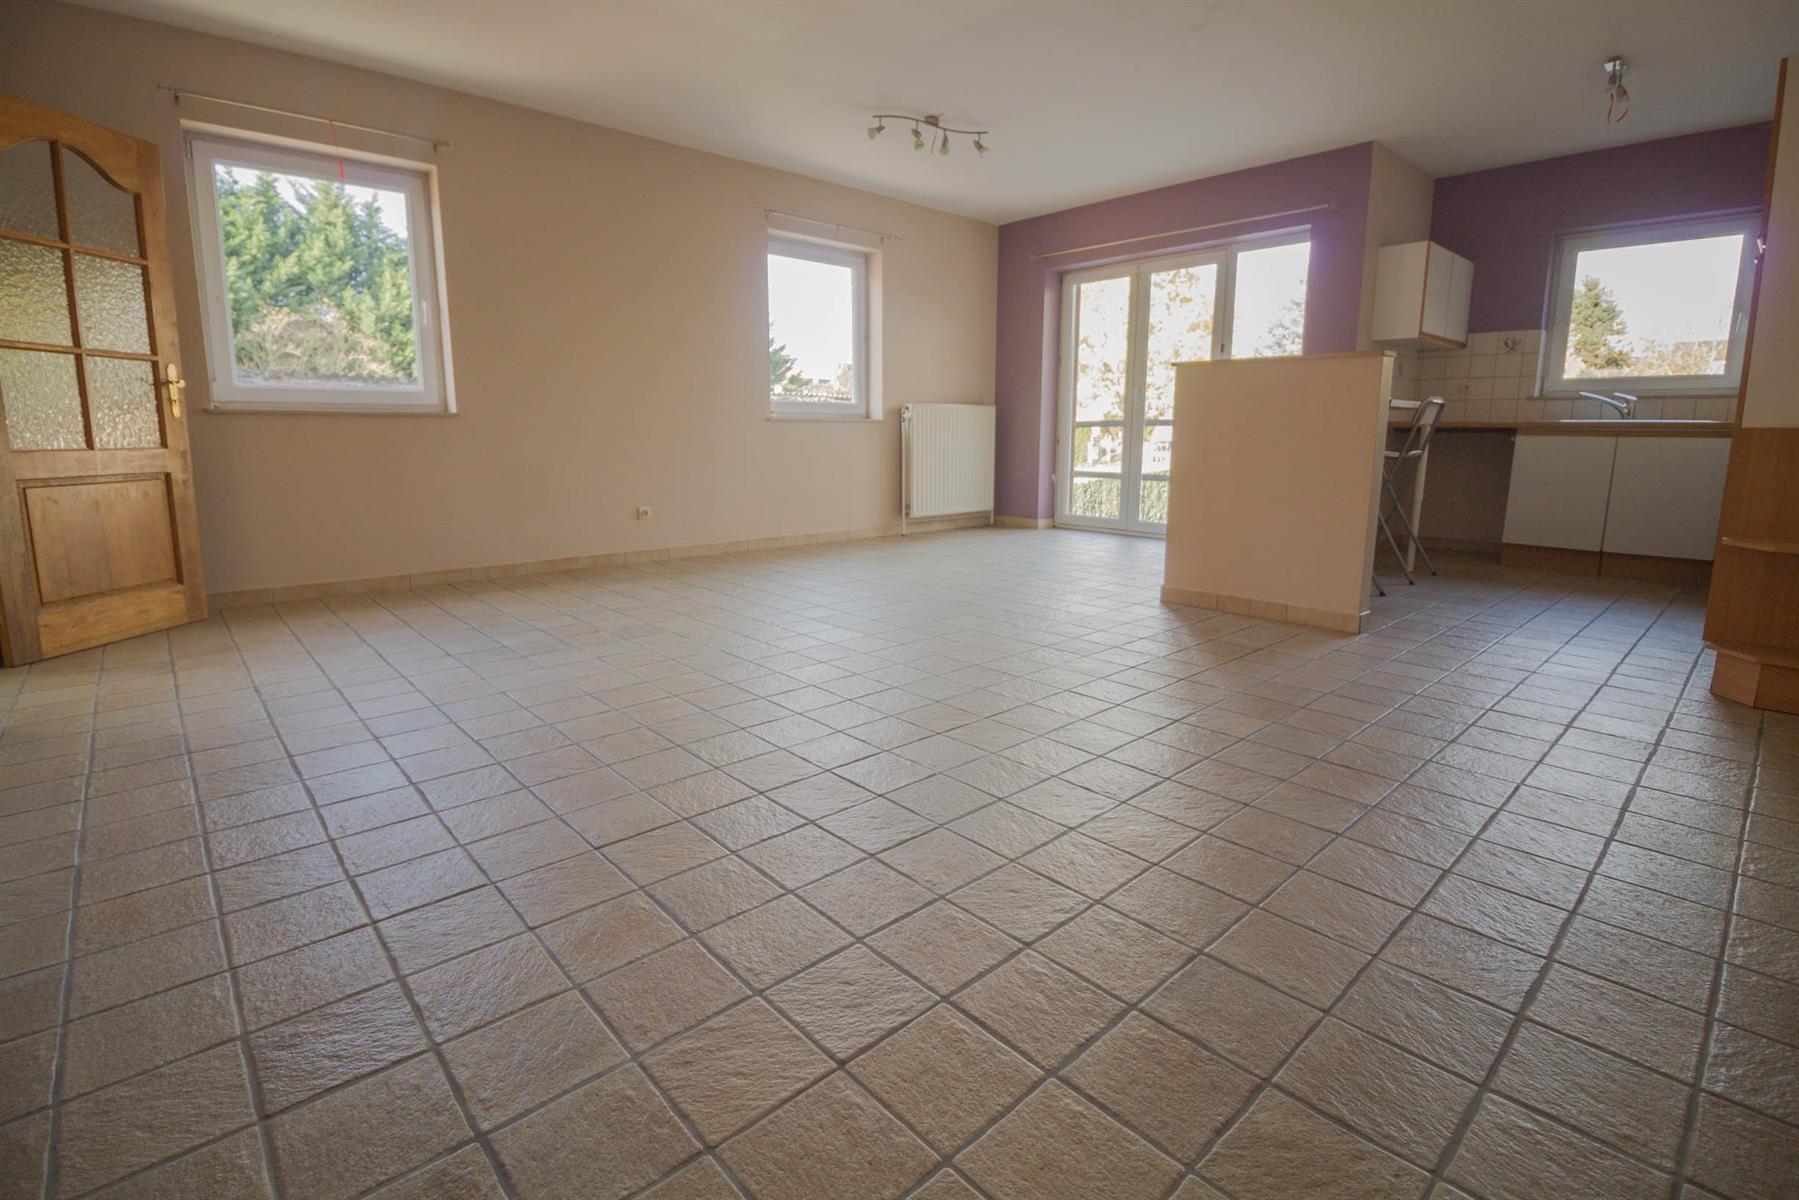 Appartement - Courcelles - #4226901-7